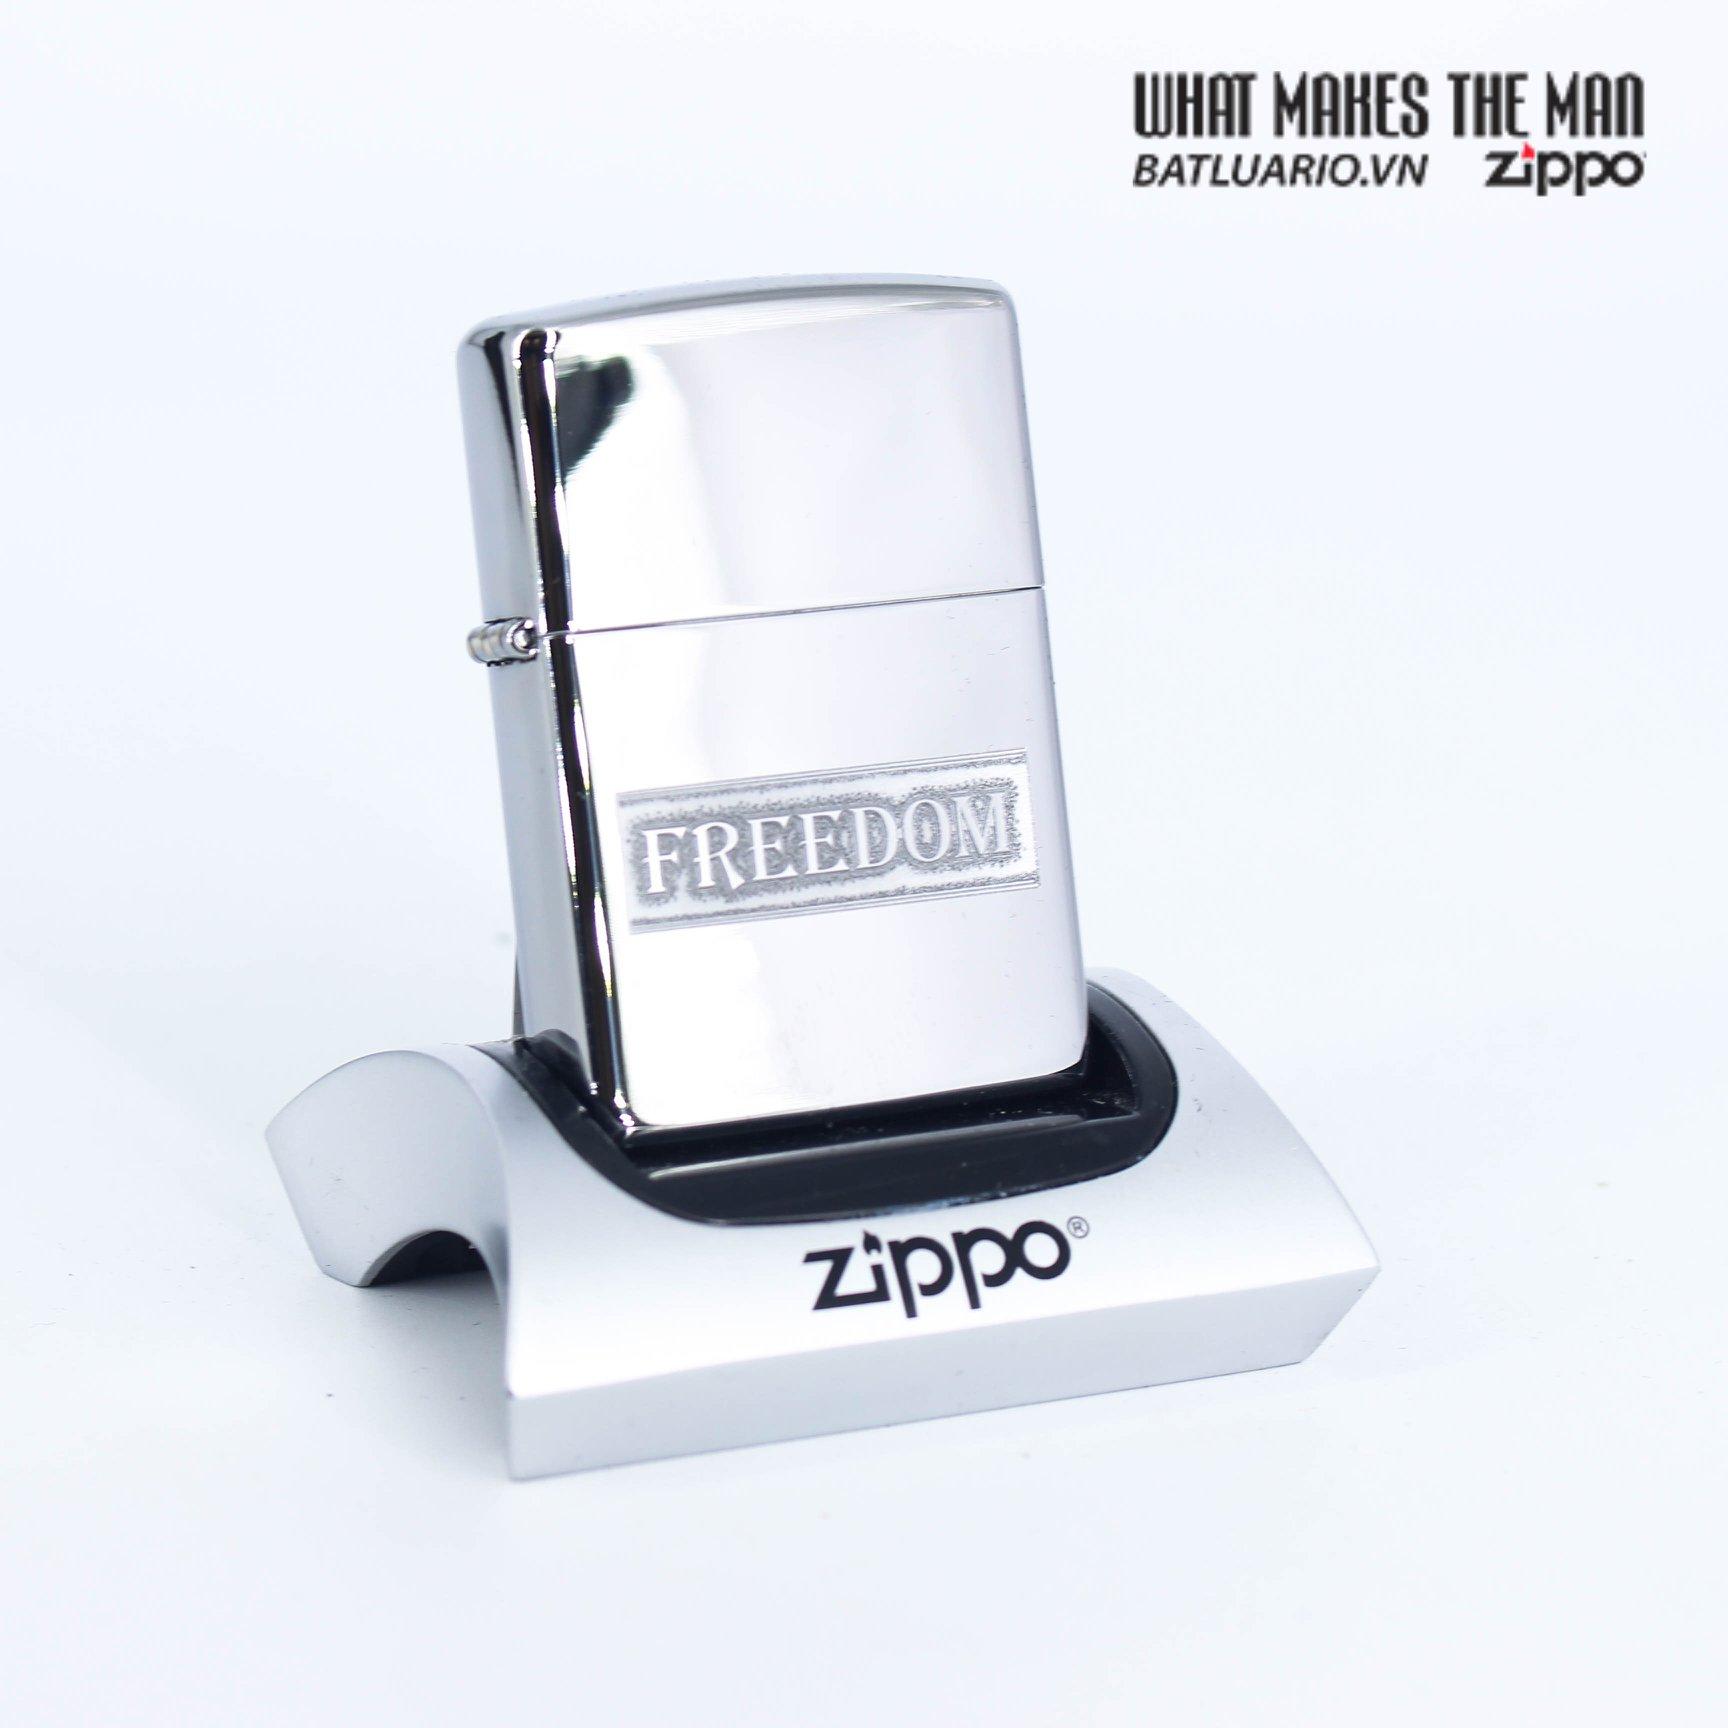 Zippo 49129 - Zippo Etched Freedom Design High Polish Chrome 1